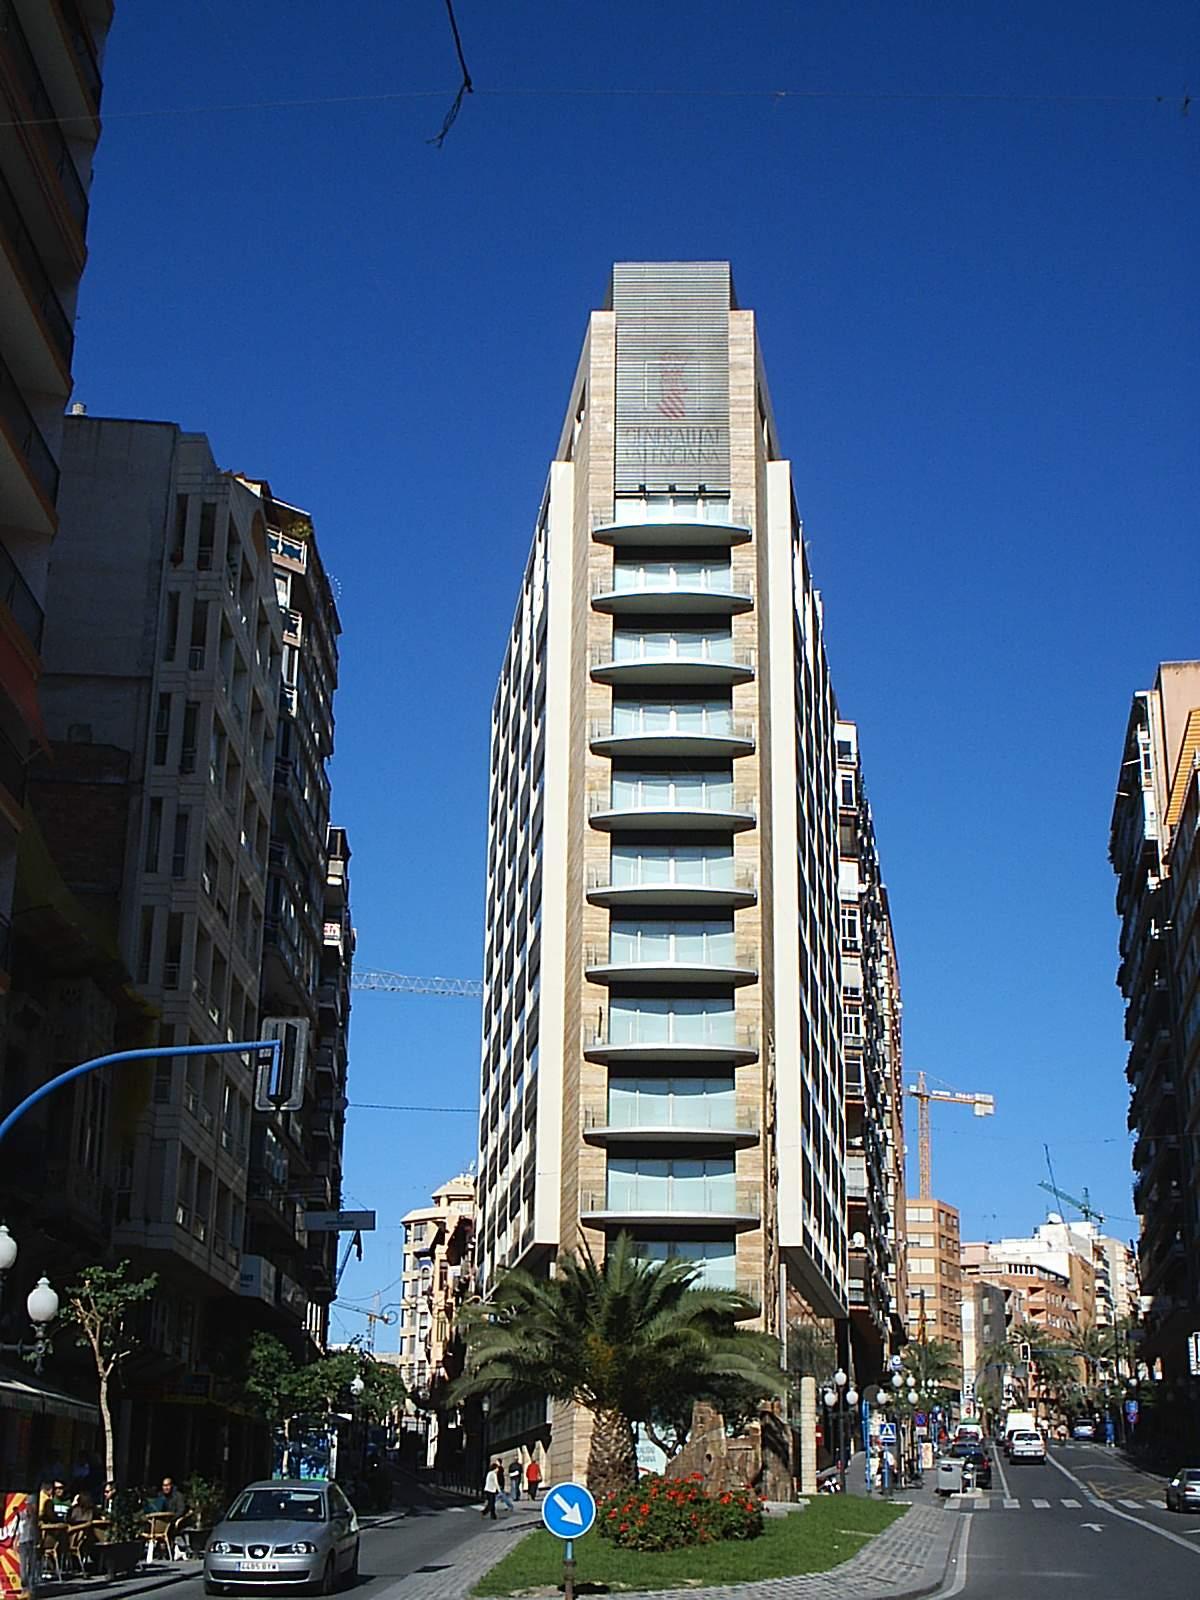 Provinčná veža v la rambla de alicante